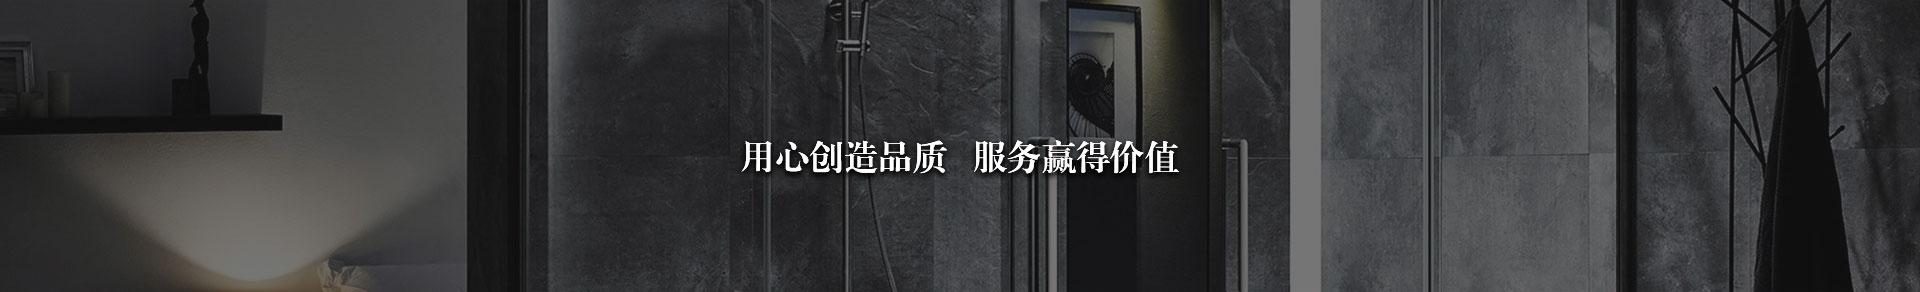 http://www.junlonglunyi.com/data/images/slide/20190701101222_399.jpg